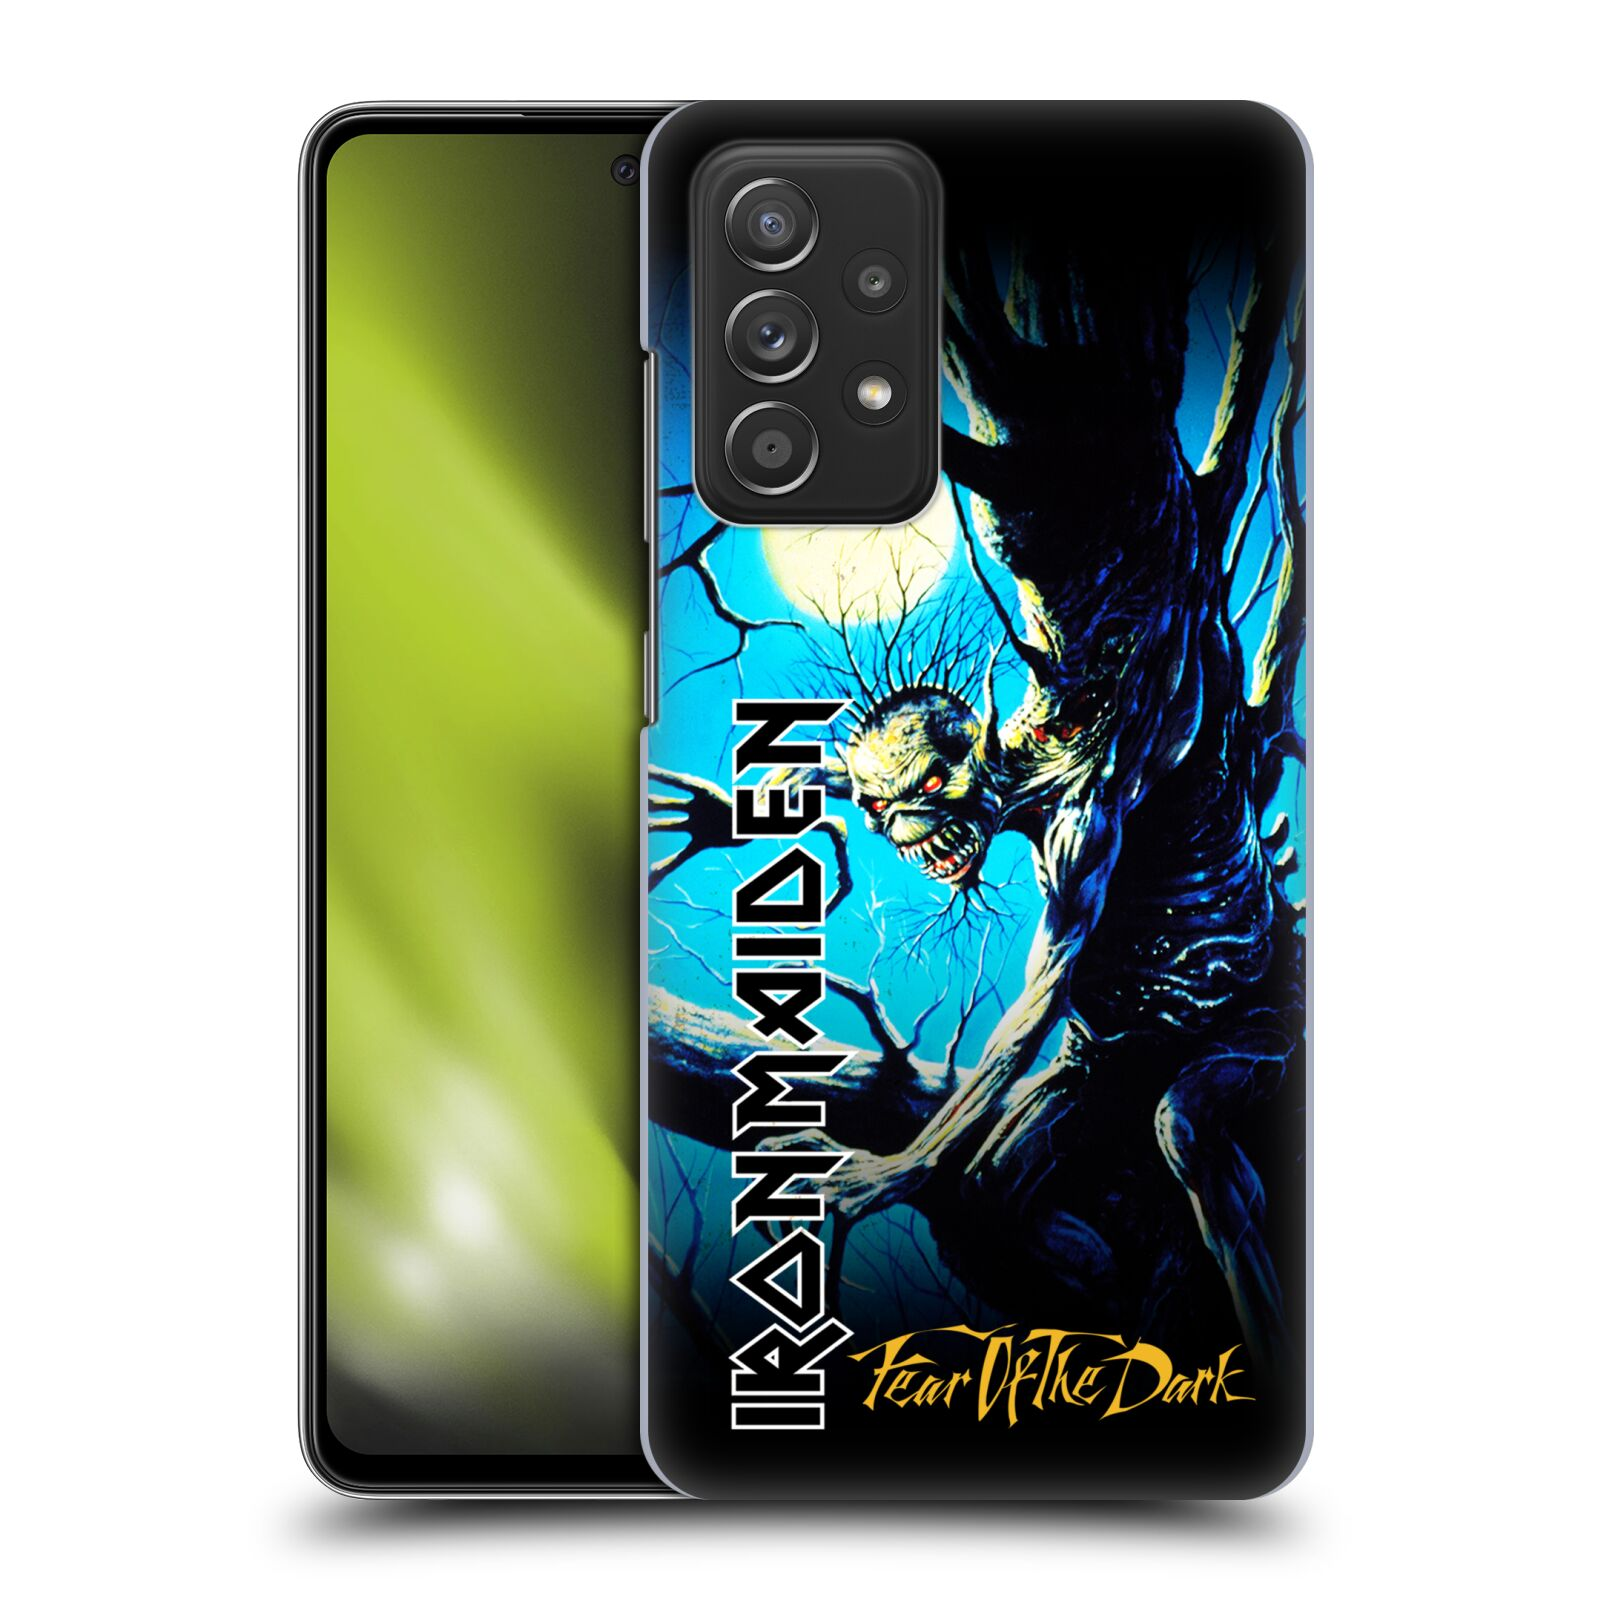 Plastové pouzdro na mobil Samsung Galaxy A52 / A52 5G / A52s 5G - Head Case - Iron Maiden - Fear Of The Dark